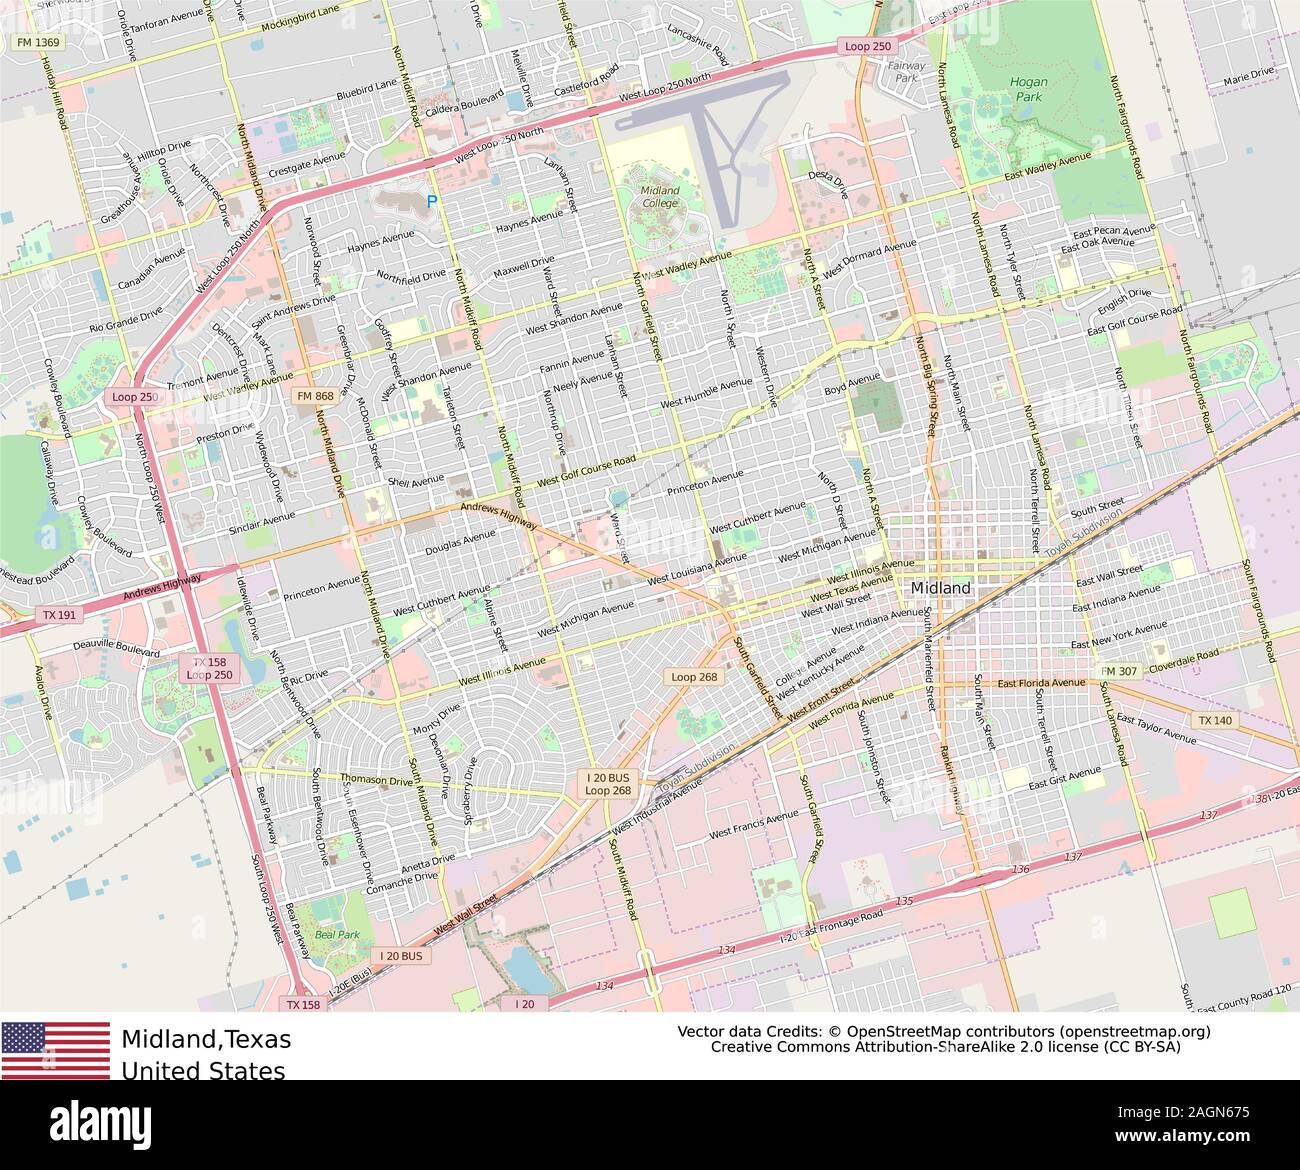 Midland,Texas,USA Stock Vector Art & Illustration, Vector ... on road map of fort collins colorado, road map of galveston texas, road map of elizabeth new jersey, road map of harris county texas, road map of killeen texas, road map of tacoma washington, large map of texas, road map of los angeles california, road map of columbia south carolina, road map of salt lake city utah, street map of odessa texas, road map of central texas, map of west texas, road map of spring texas, road map of dallas county texas, road map of georgetown texas, road map of baytown texas, road map of little elm texas, map of winkler county texas, road map of kennedy texas,